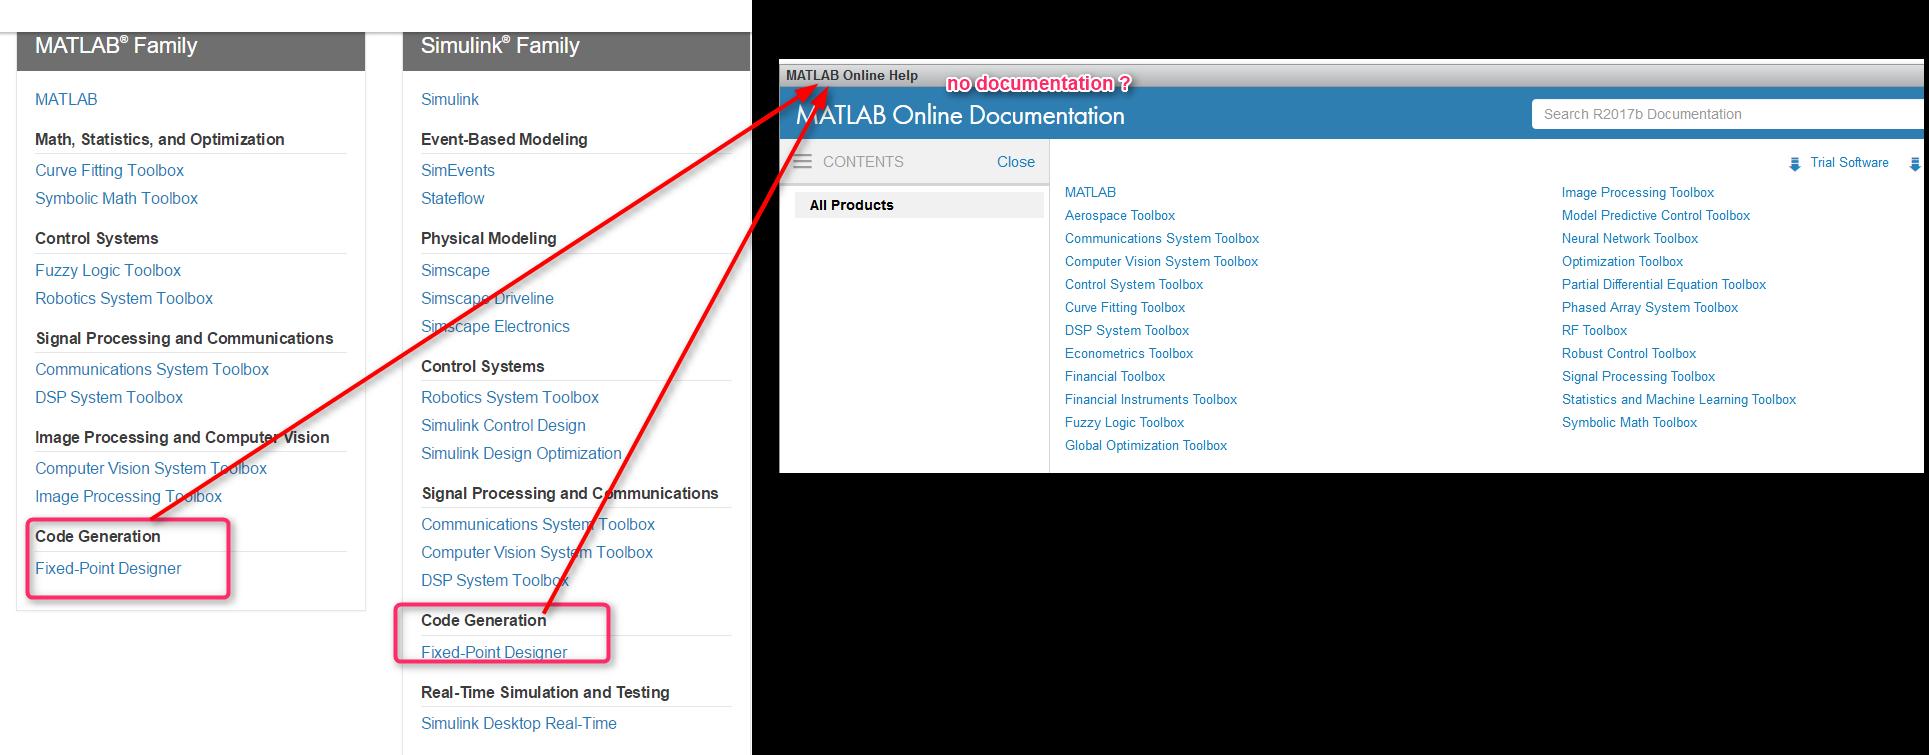 Matlab Online Missing Documentation Matlab Answers Matlab Central